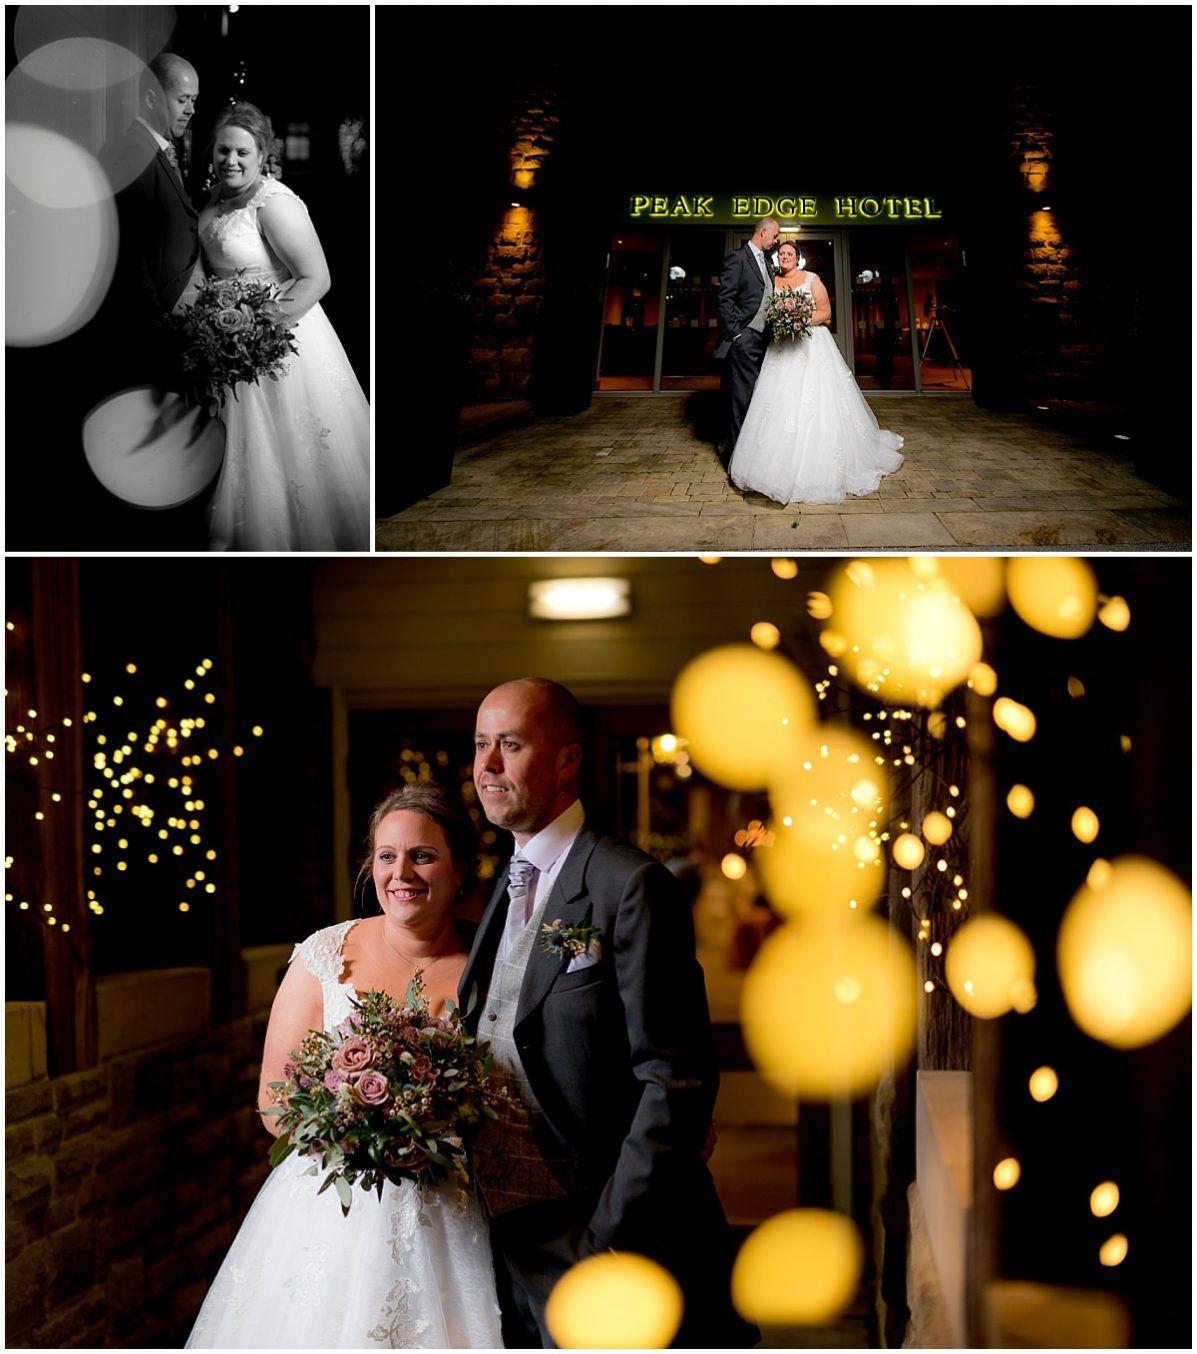 Peak Edge Hotel bride and groom